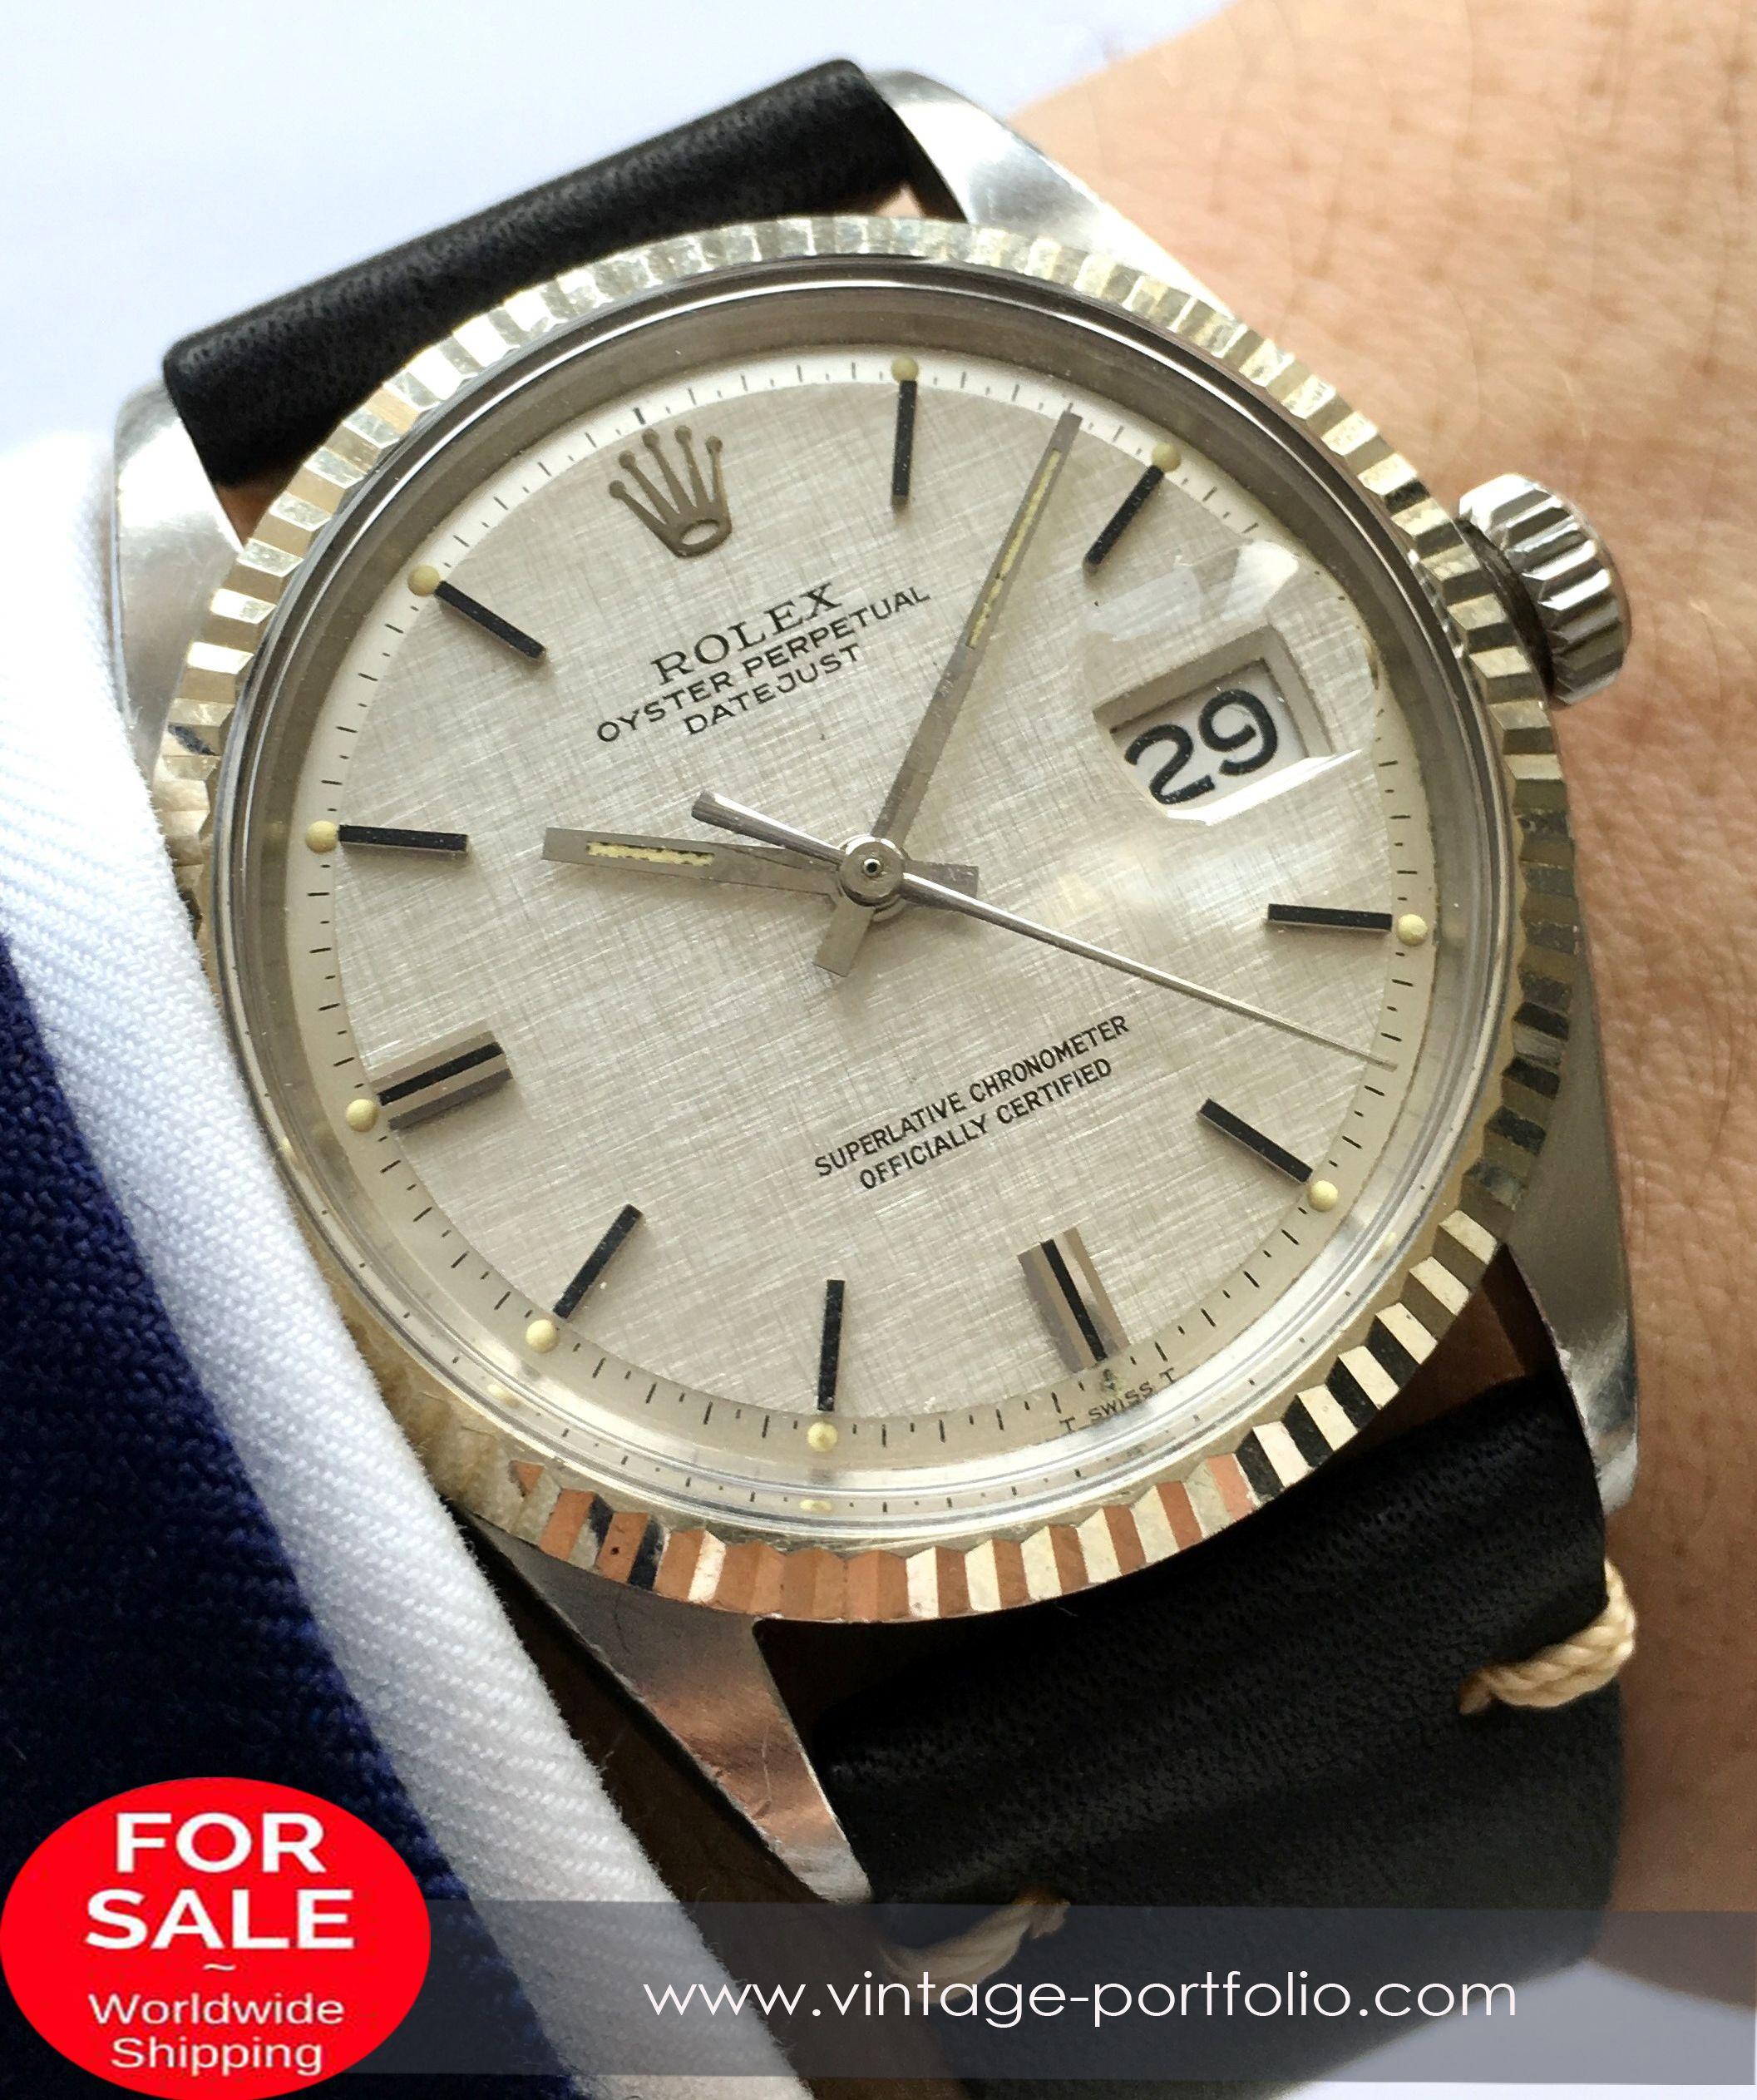 Serviced Rolex Datejust Automatik With Amazing Silver Linen Dial And Vintage Strap Rolex Timepiece Rolexoff Vintage Watches Best Looking Watches Rolex Men